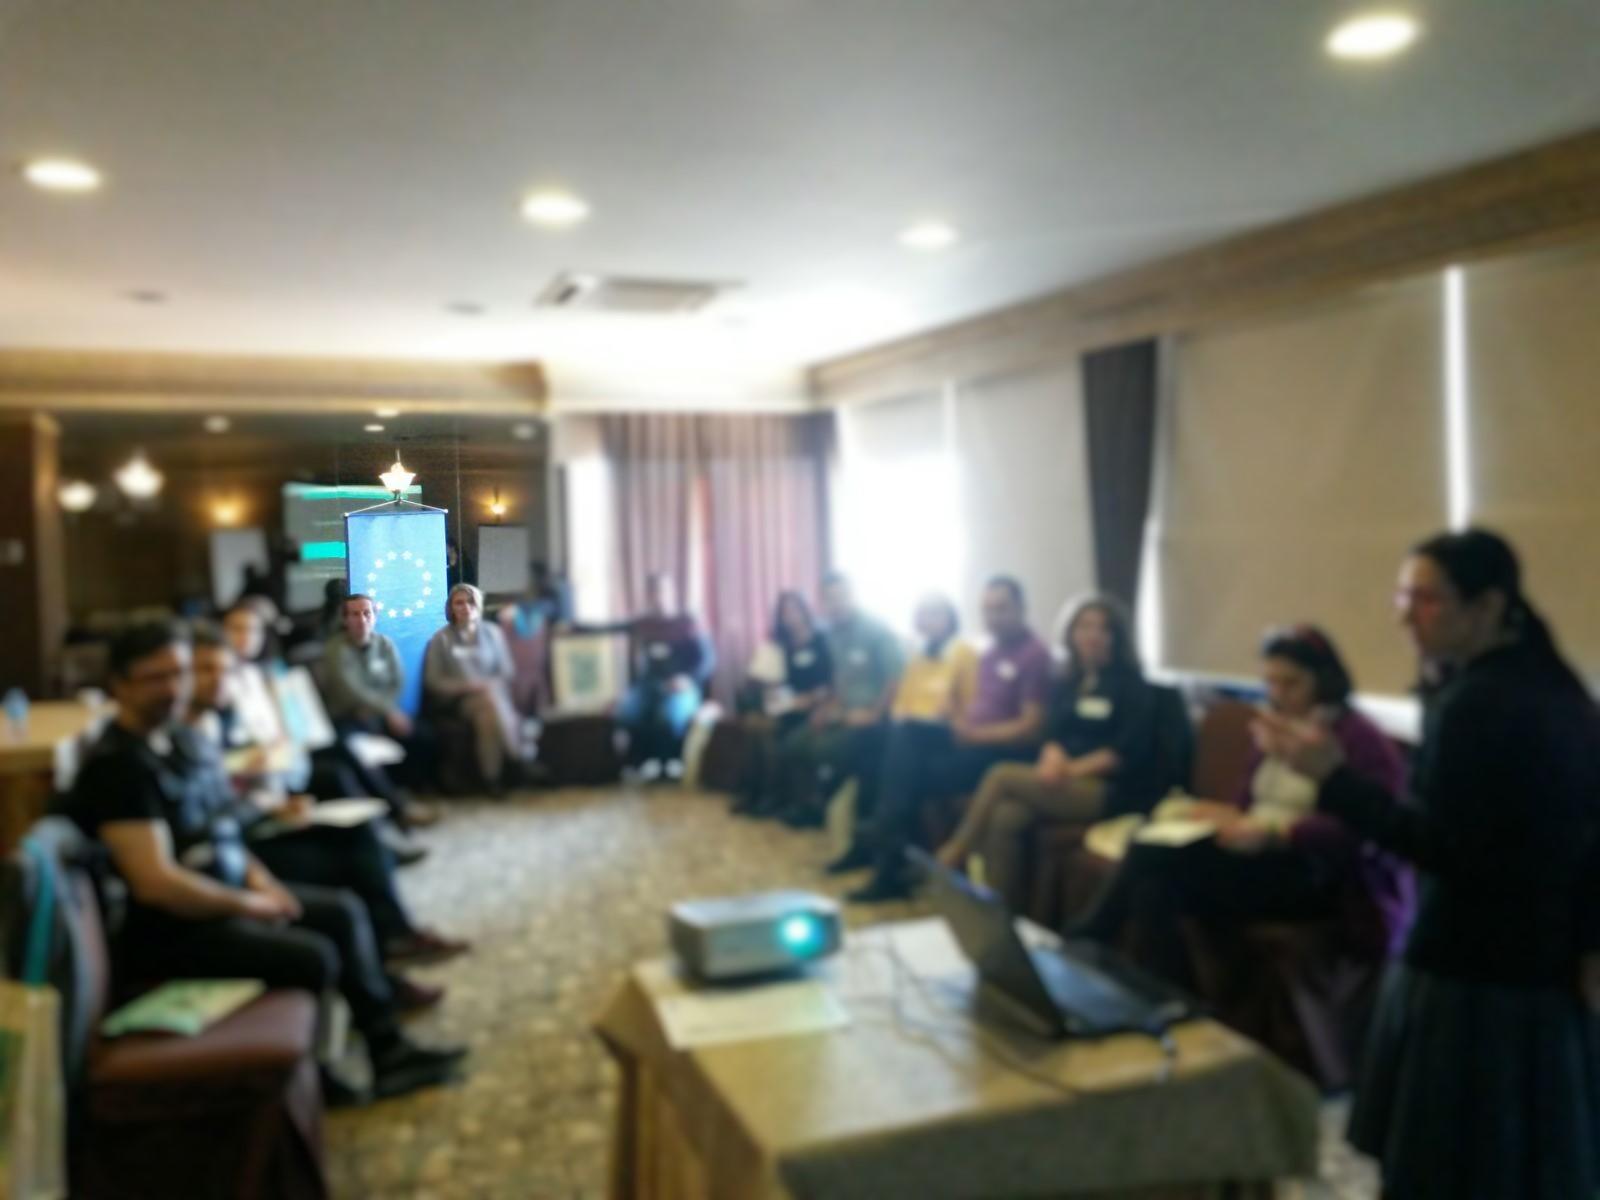 İç Anadolu 1inci Bölgesel Çalıştay Raporu